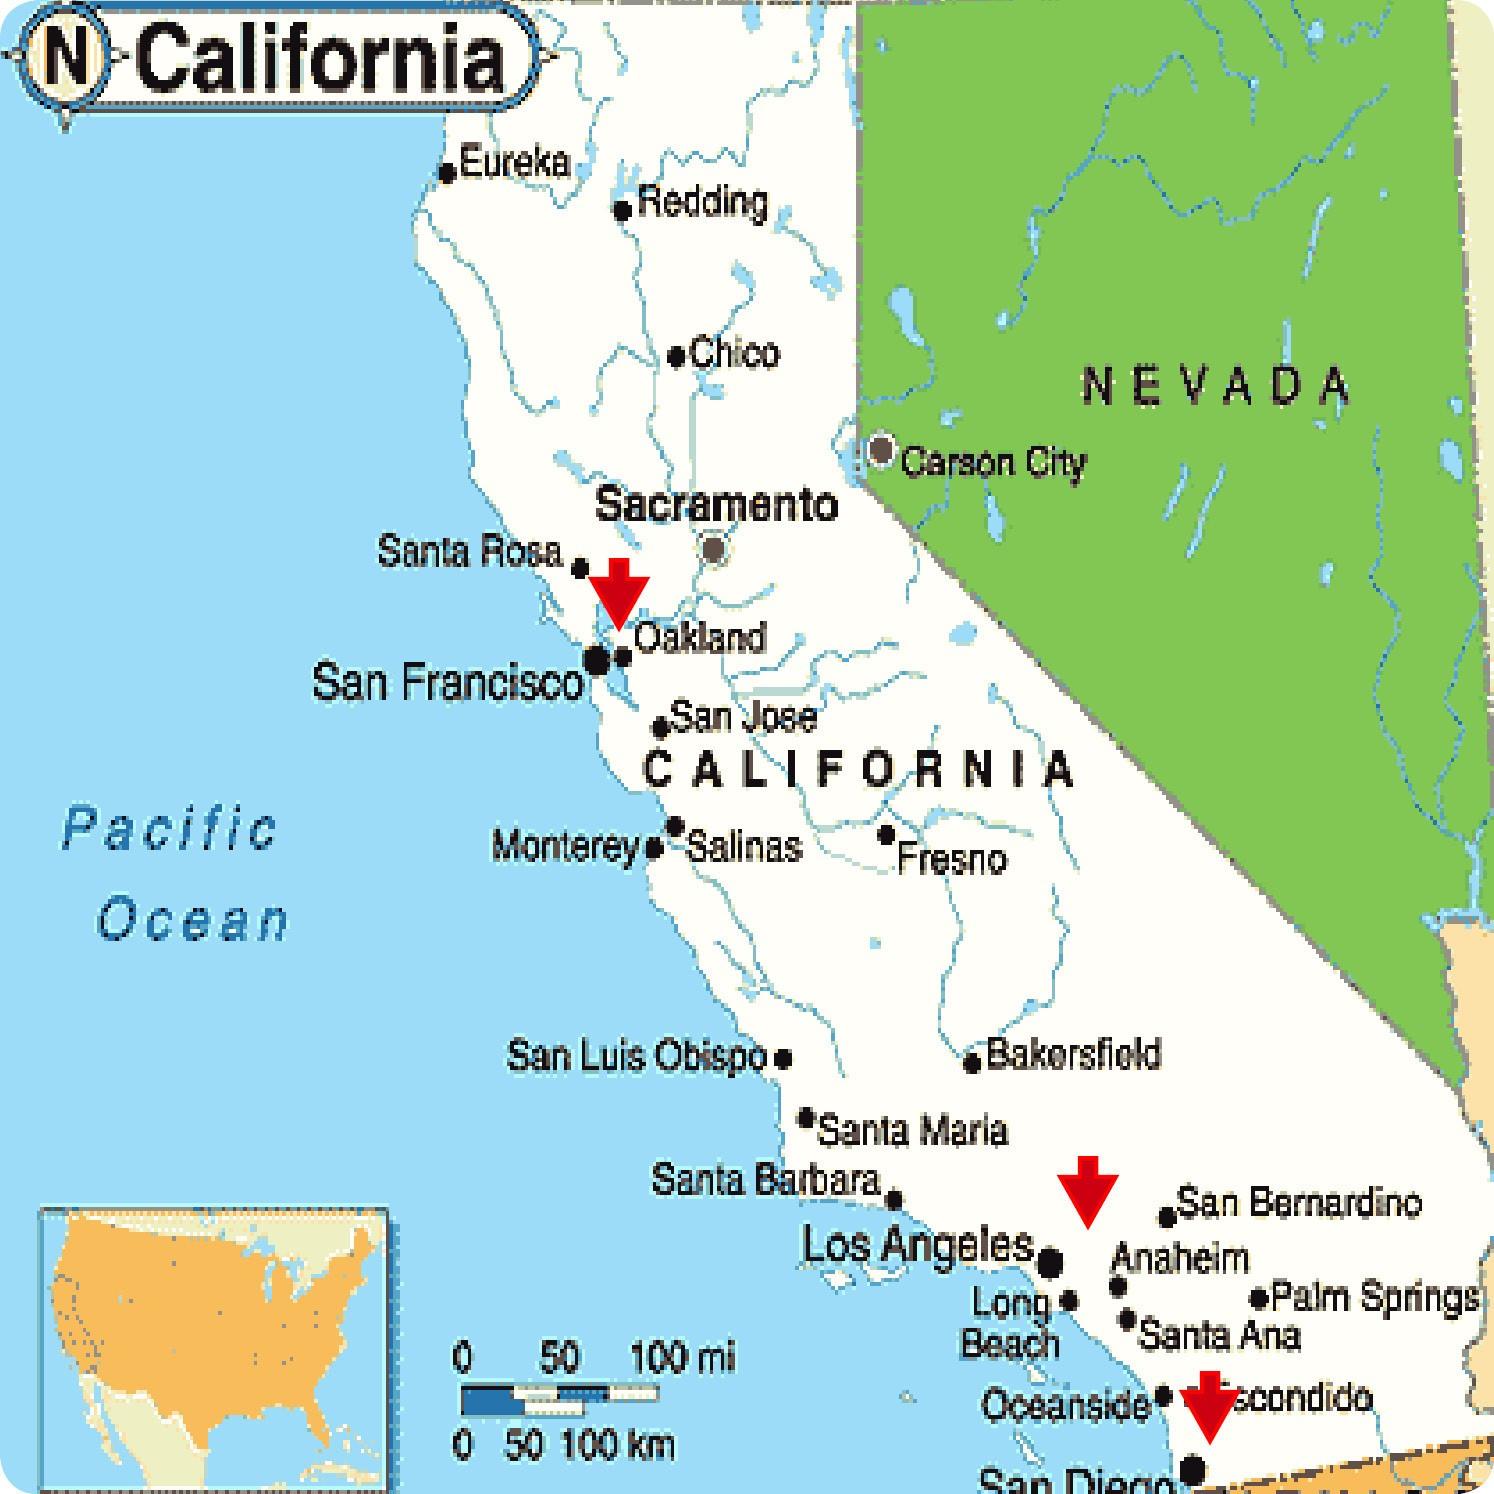 Us Map Distance Between Cities Google Maps Distance Elegant Map - Google Maps California